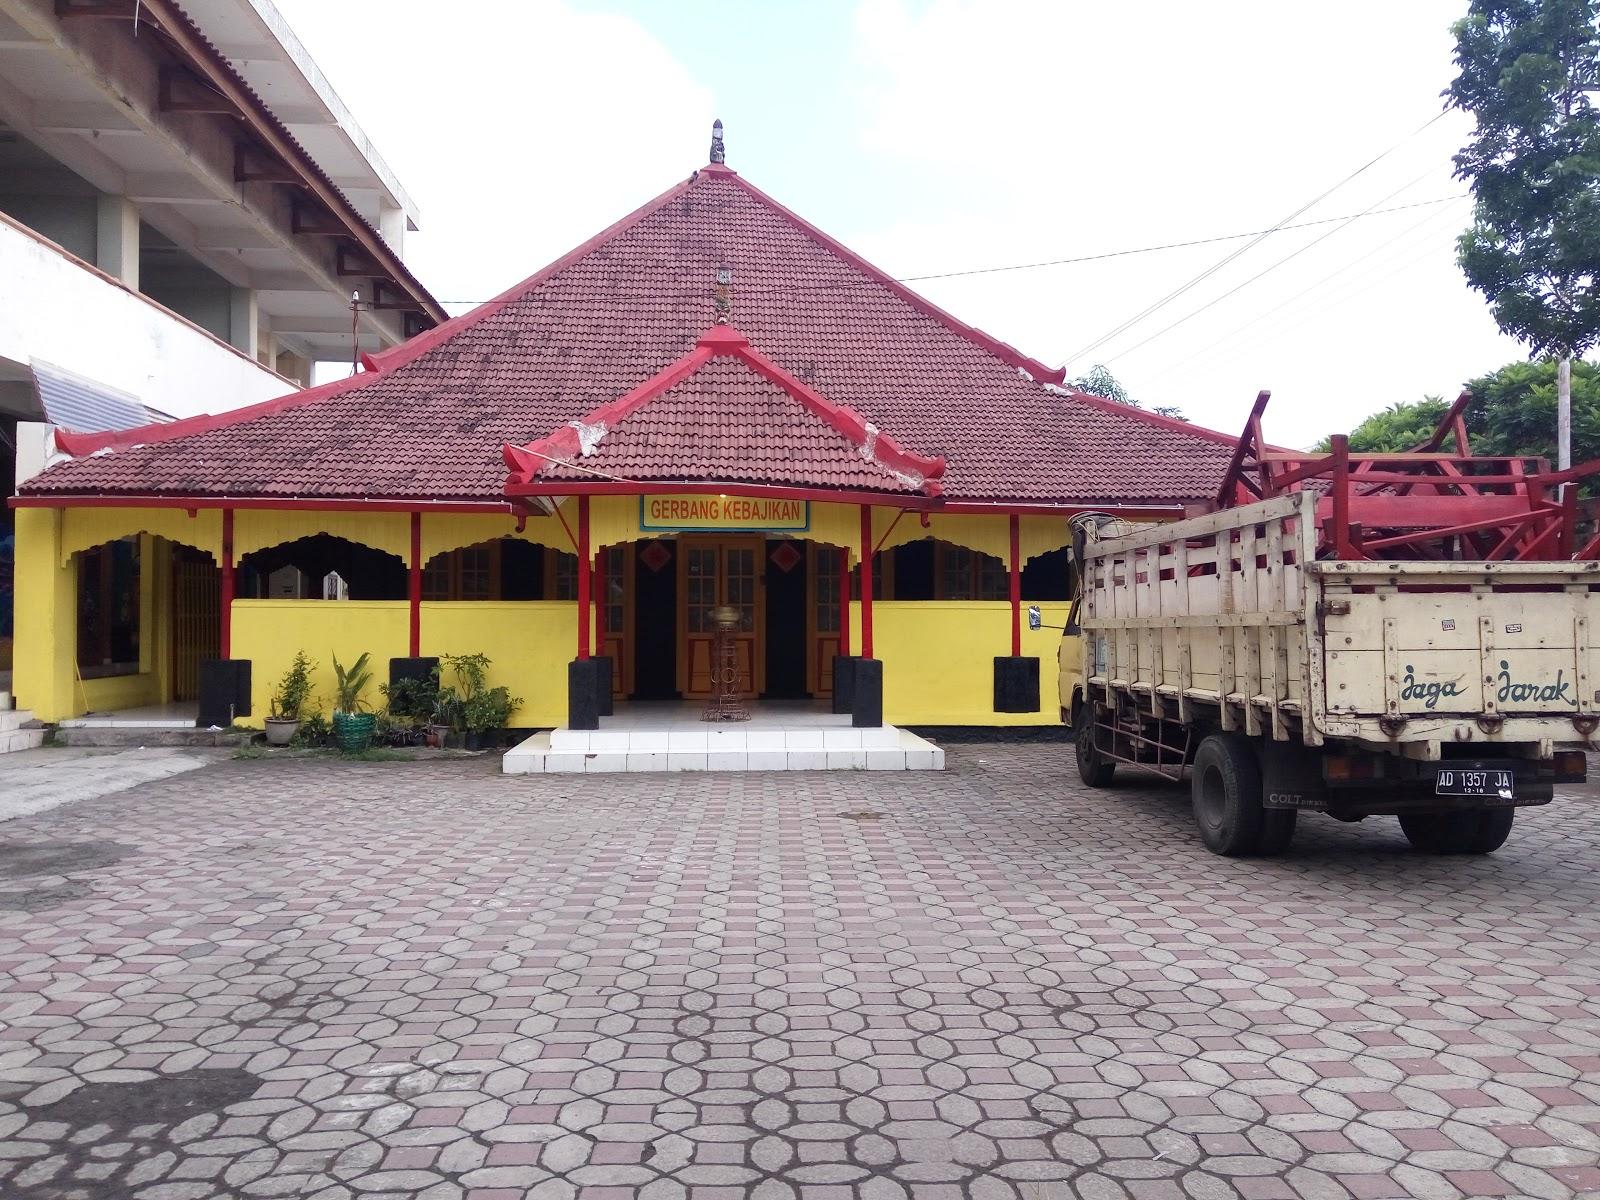 Litang Gerbang Kebajikan Surakarta Kekunaan Memasuki Bangunan Utama Pengunjung Menjumpai